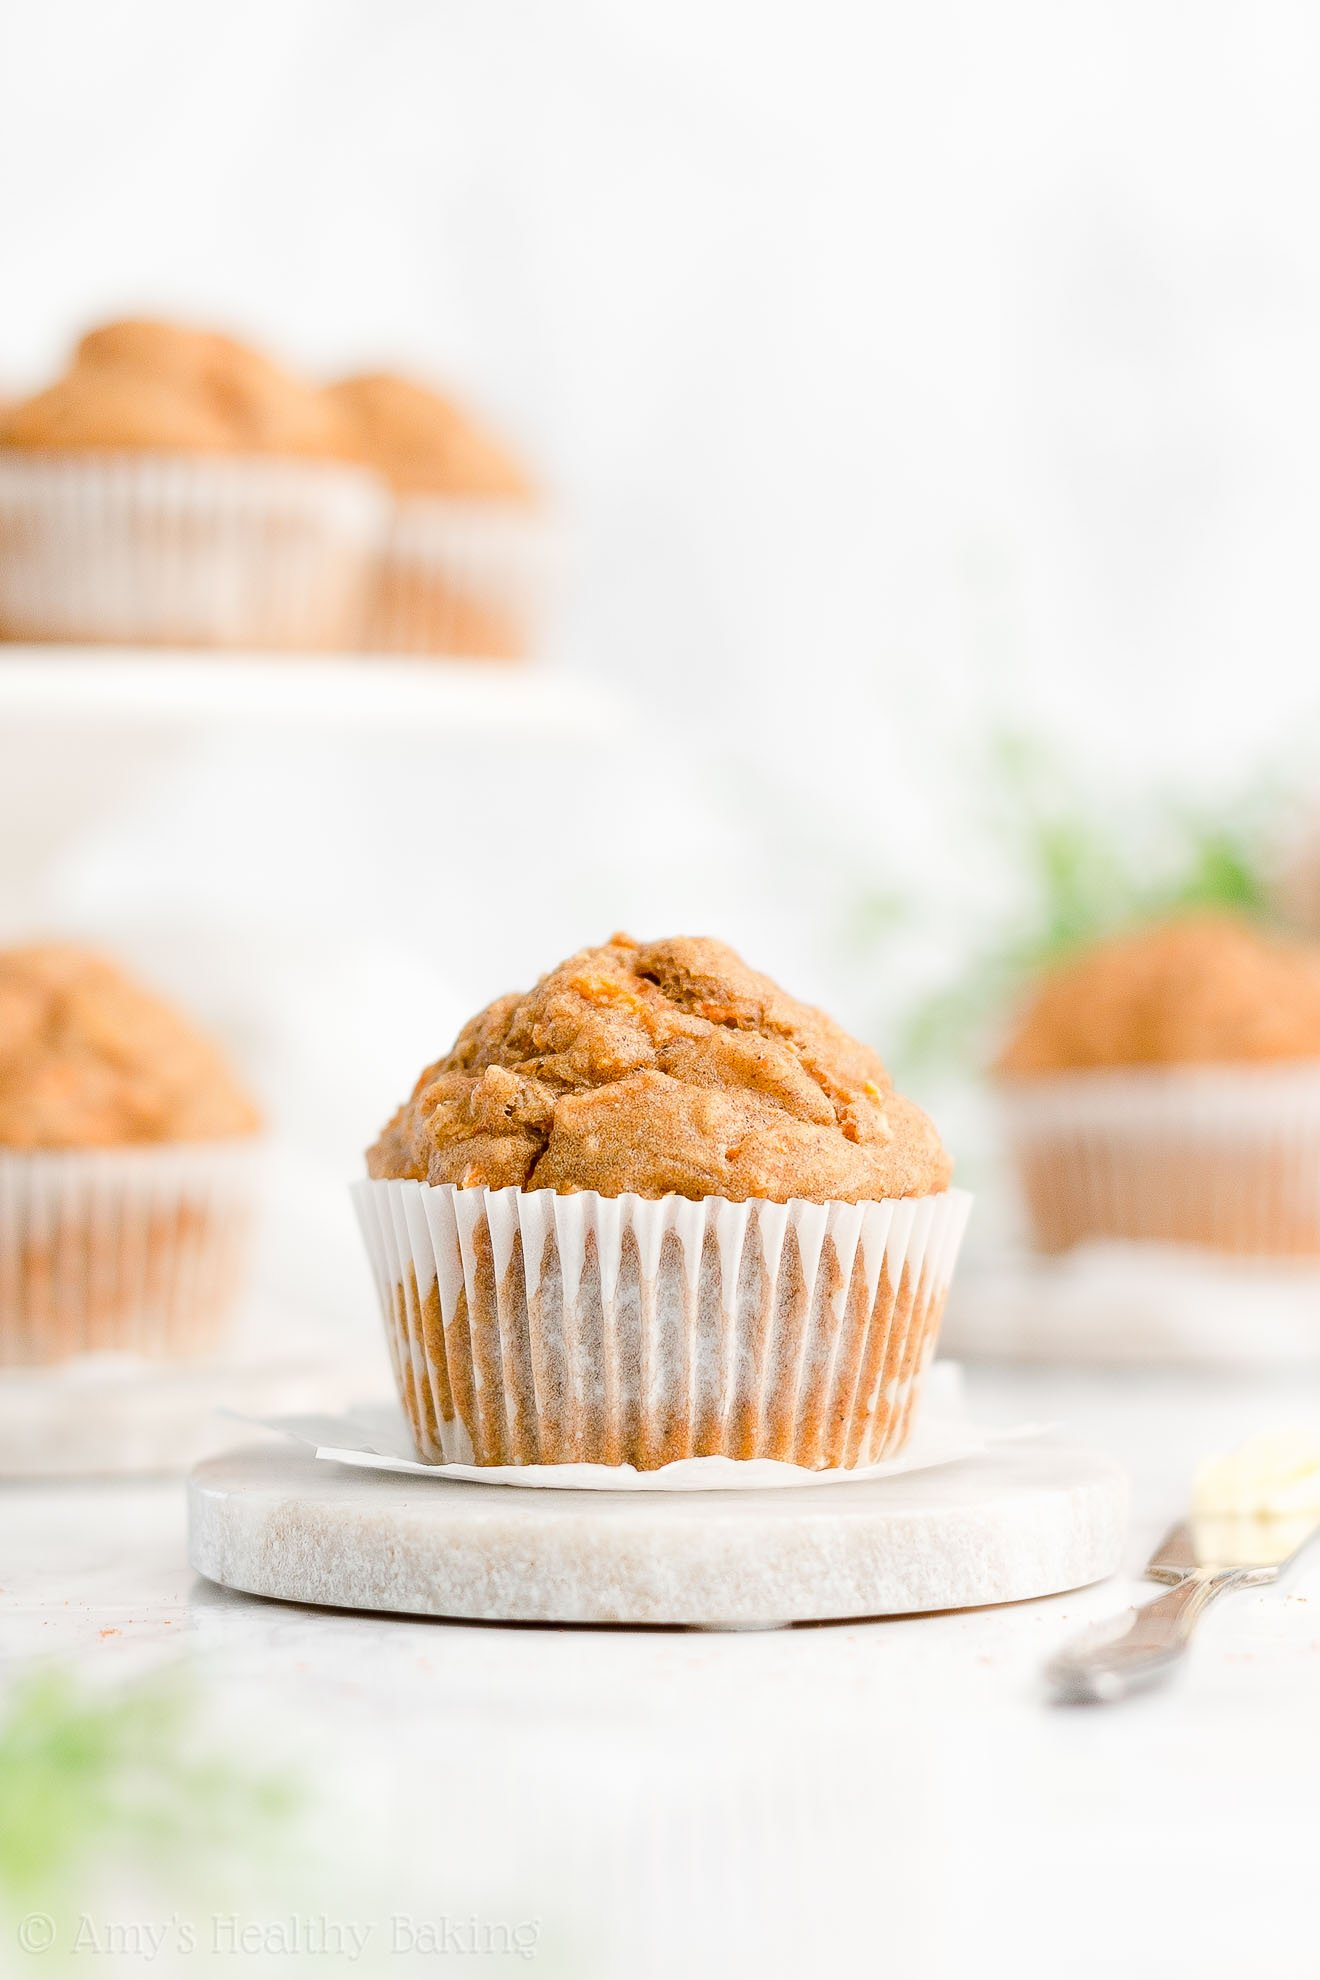 Best Easy Healthy Whole Wheat Sugar Free Moist Carrot Cake Oatmeal Muffins